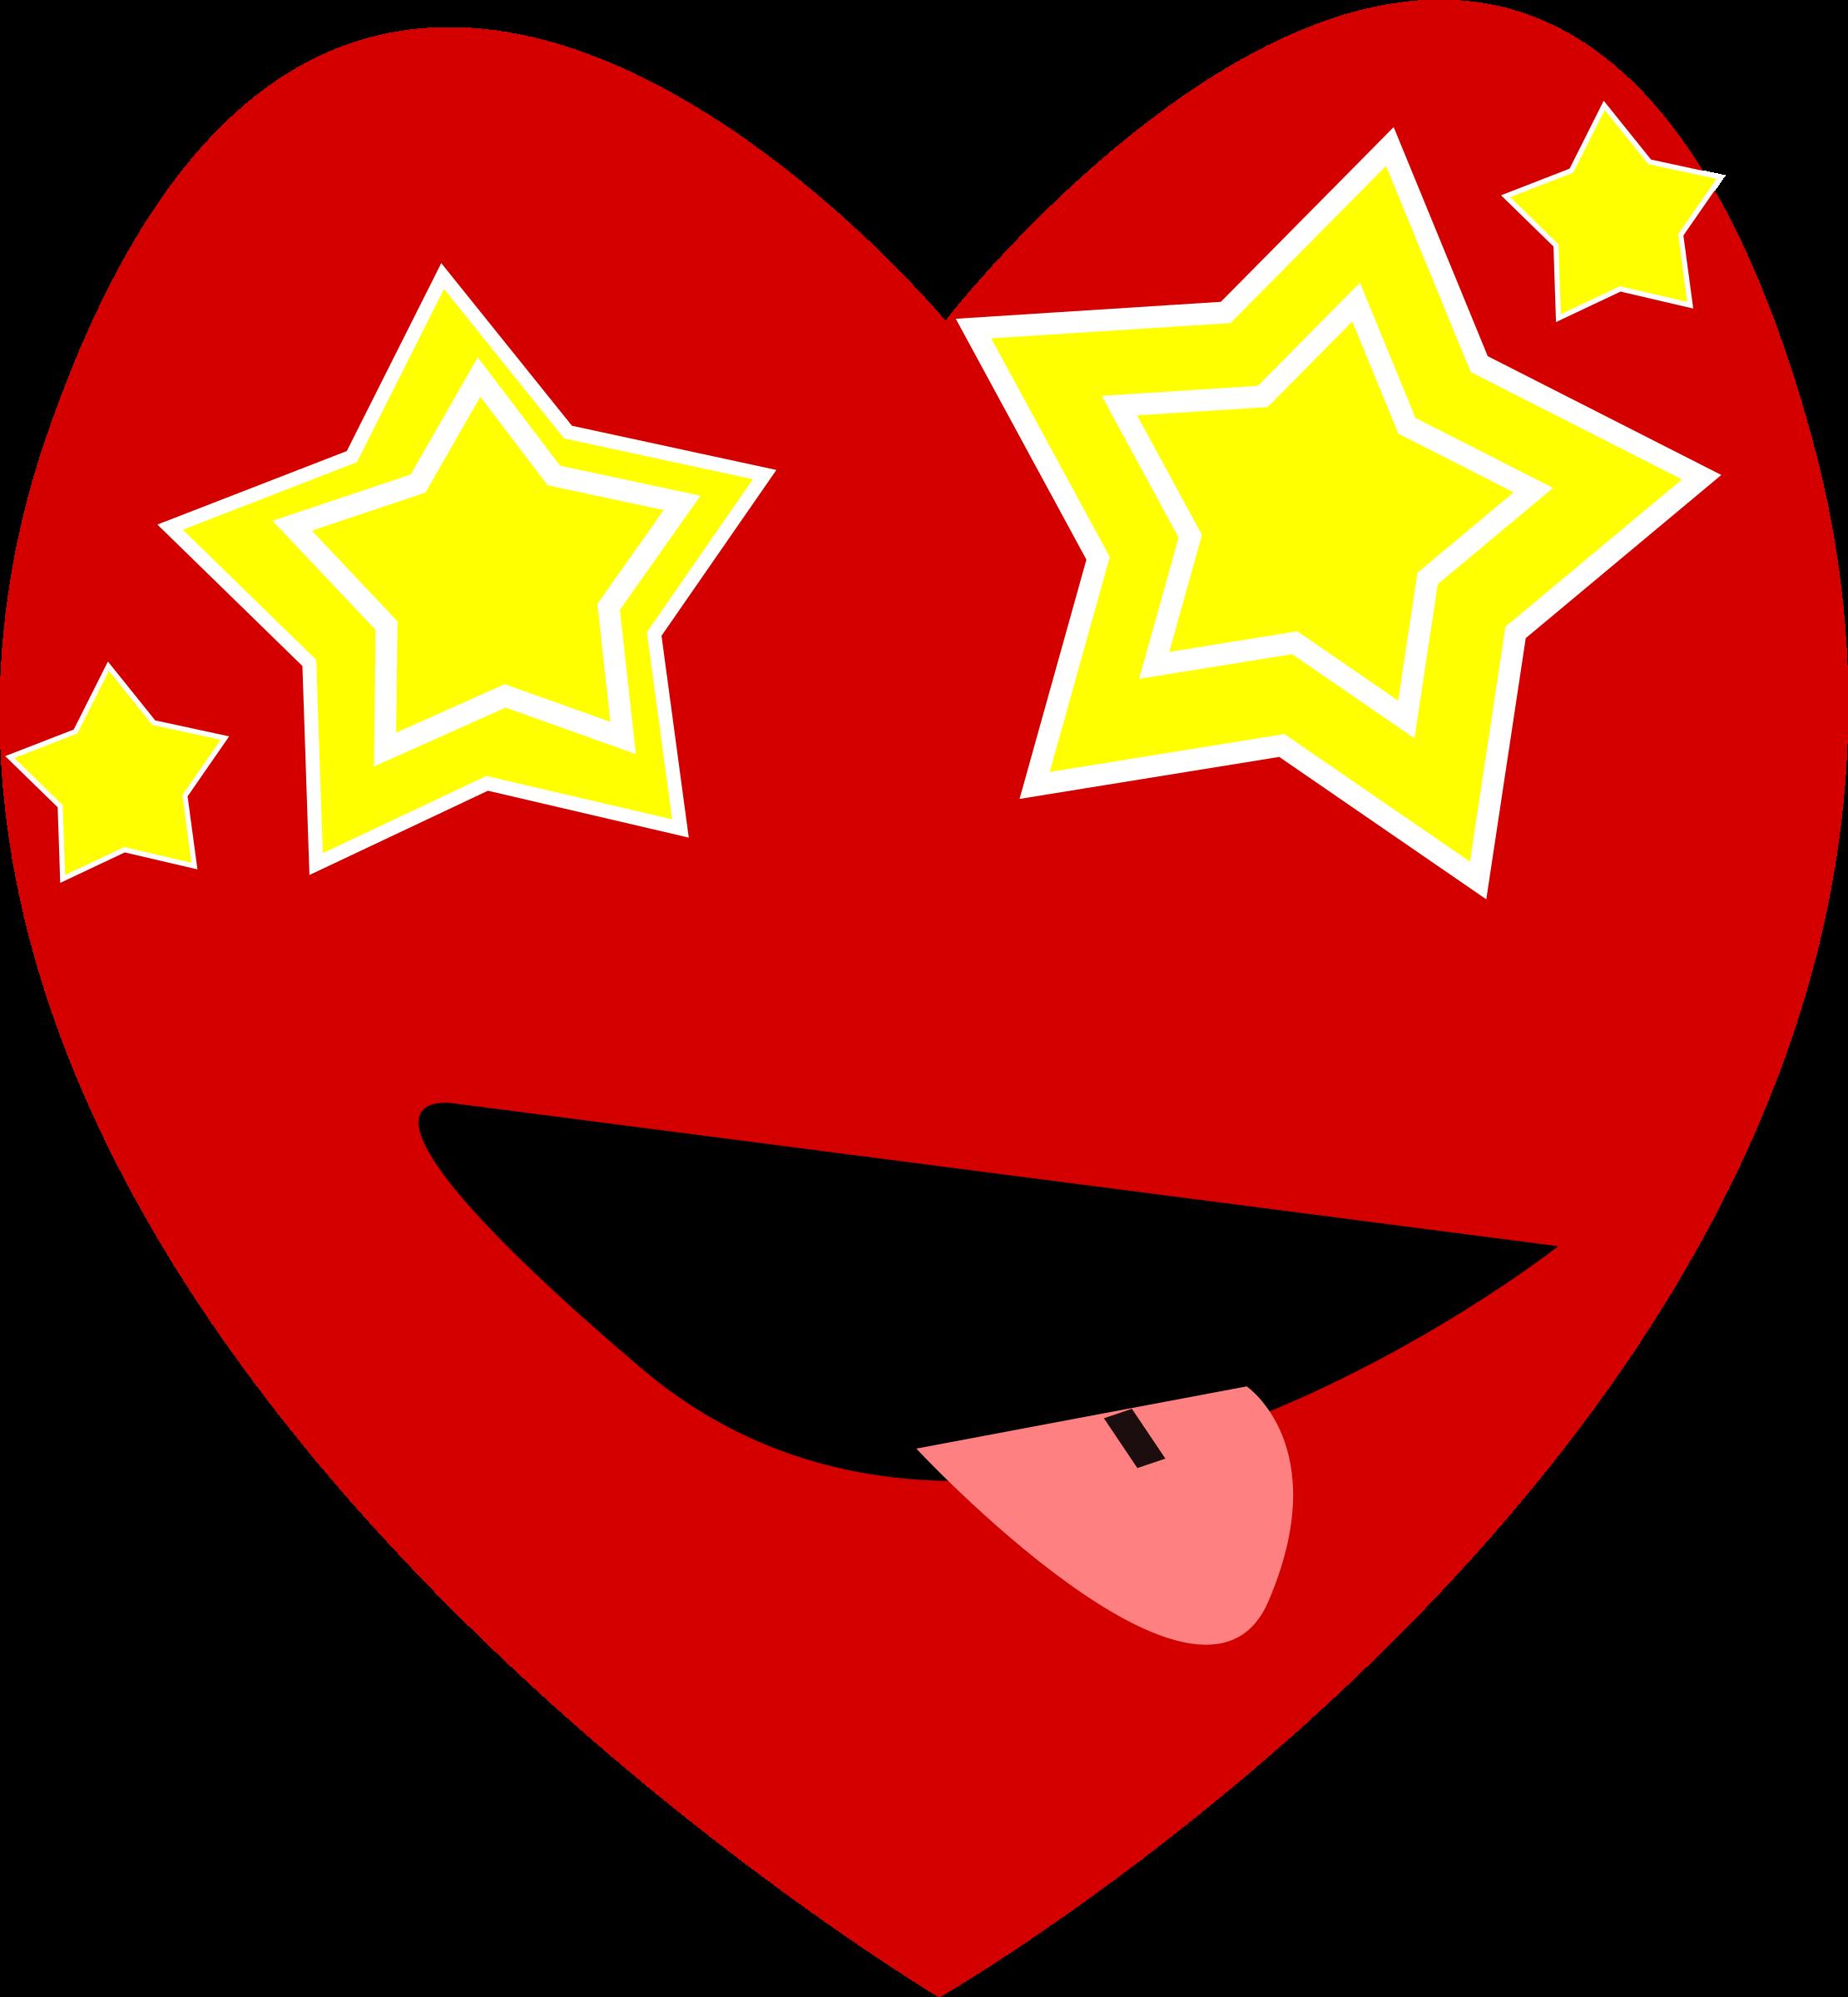 Heart eyes clipart jpg freeuse stock Clipart - Heart-Starry Eyed jpg freeuse stock